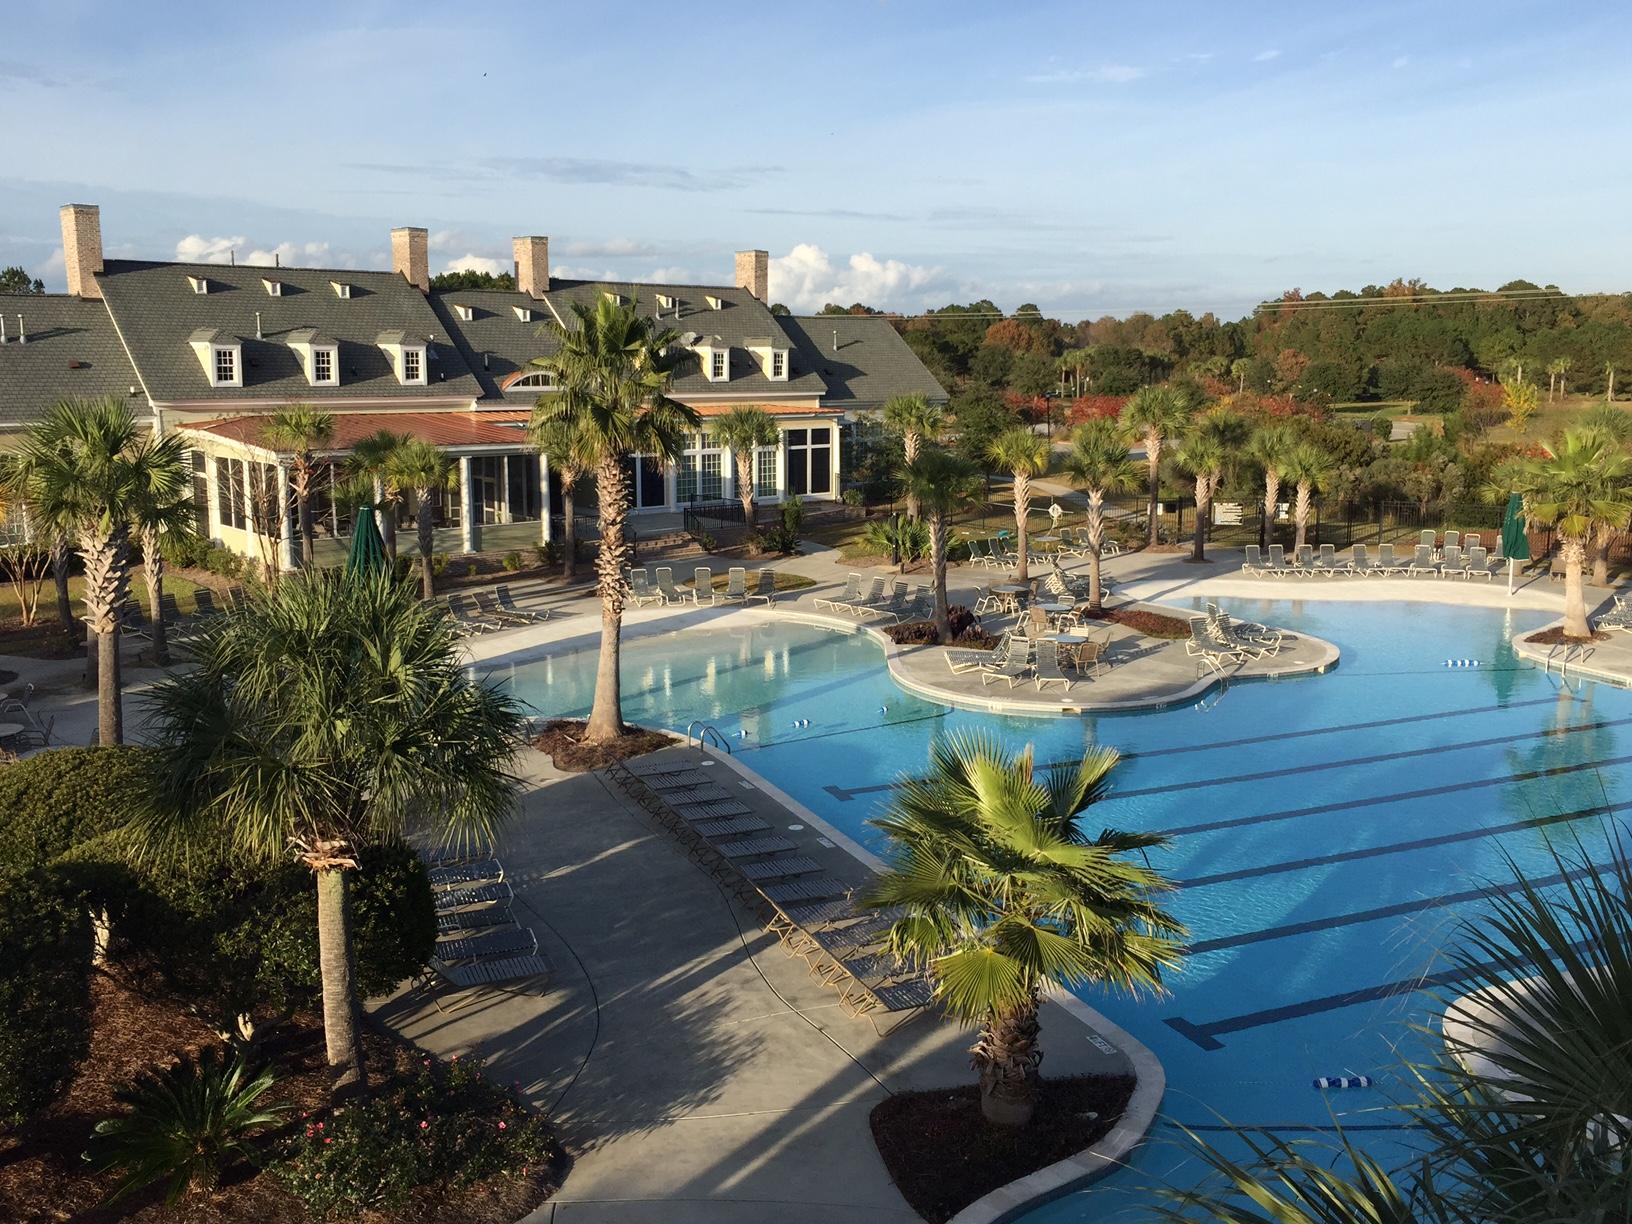 Oak Bluff Homes For Sale - 1041 Oak Bluff, Charleston, SC - 45